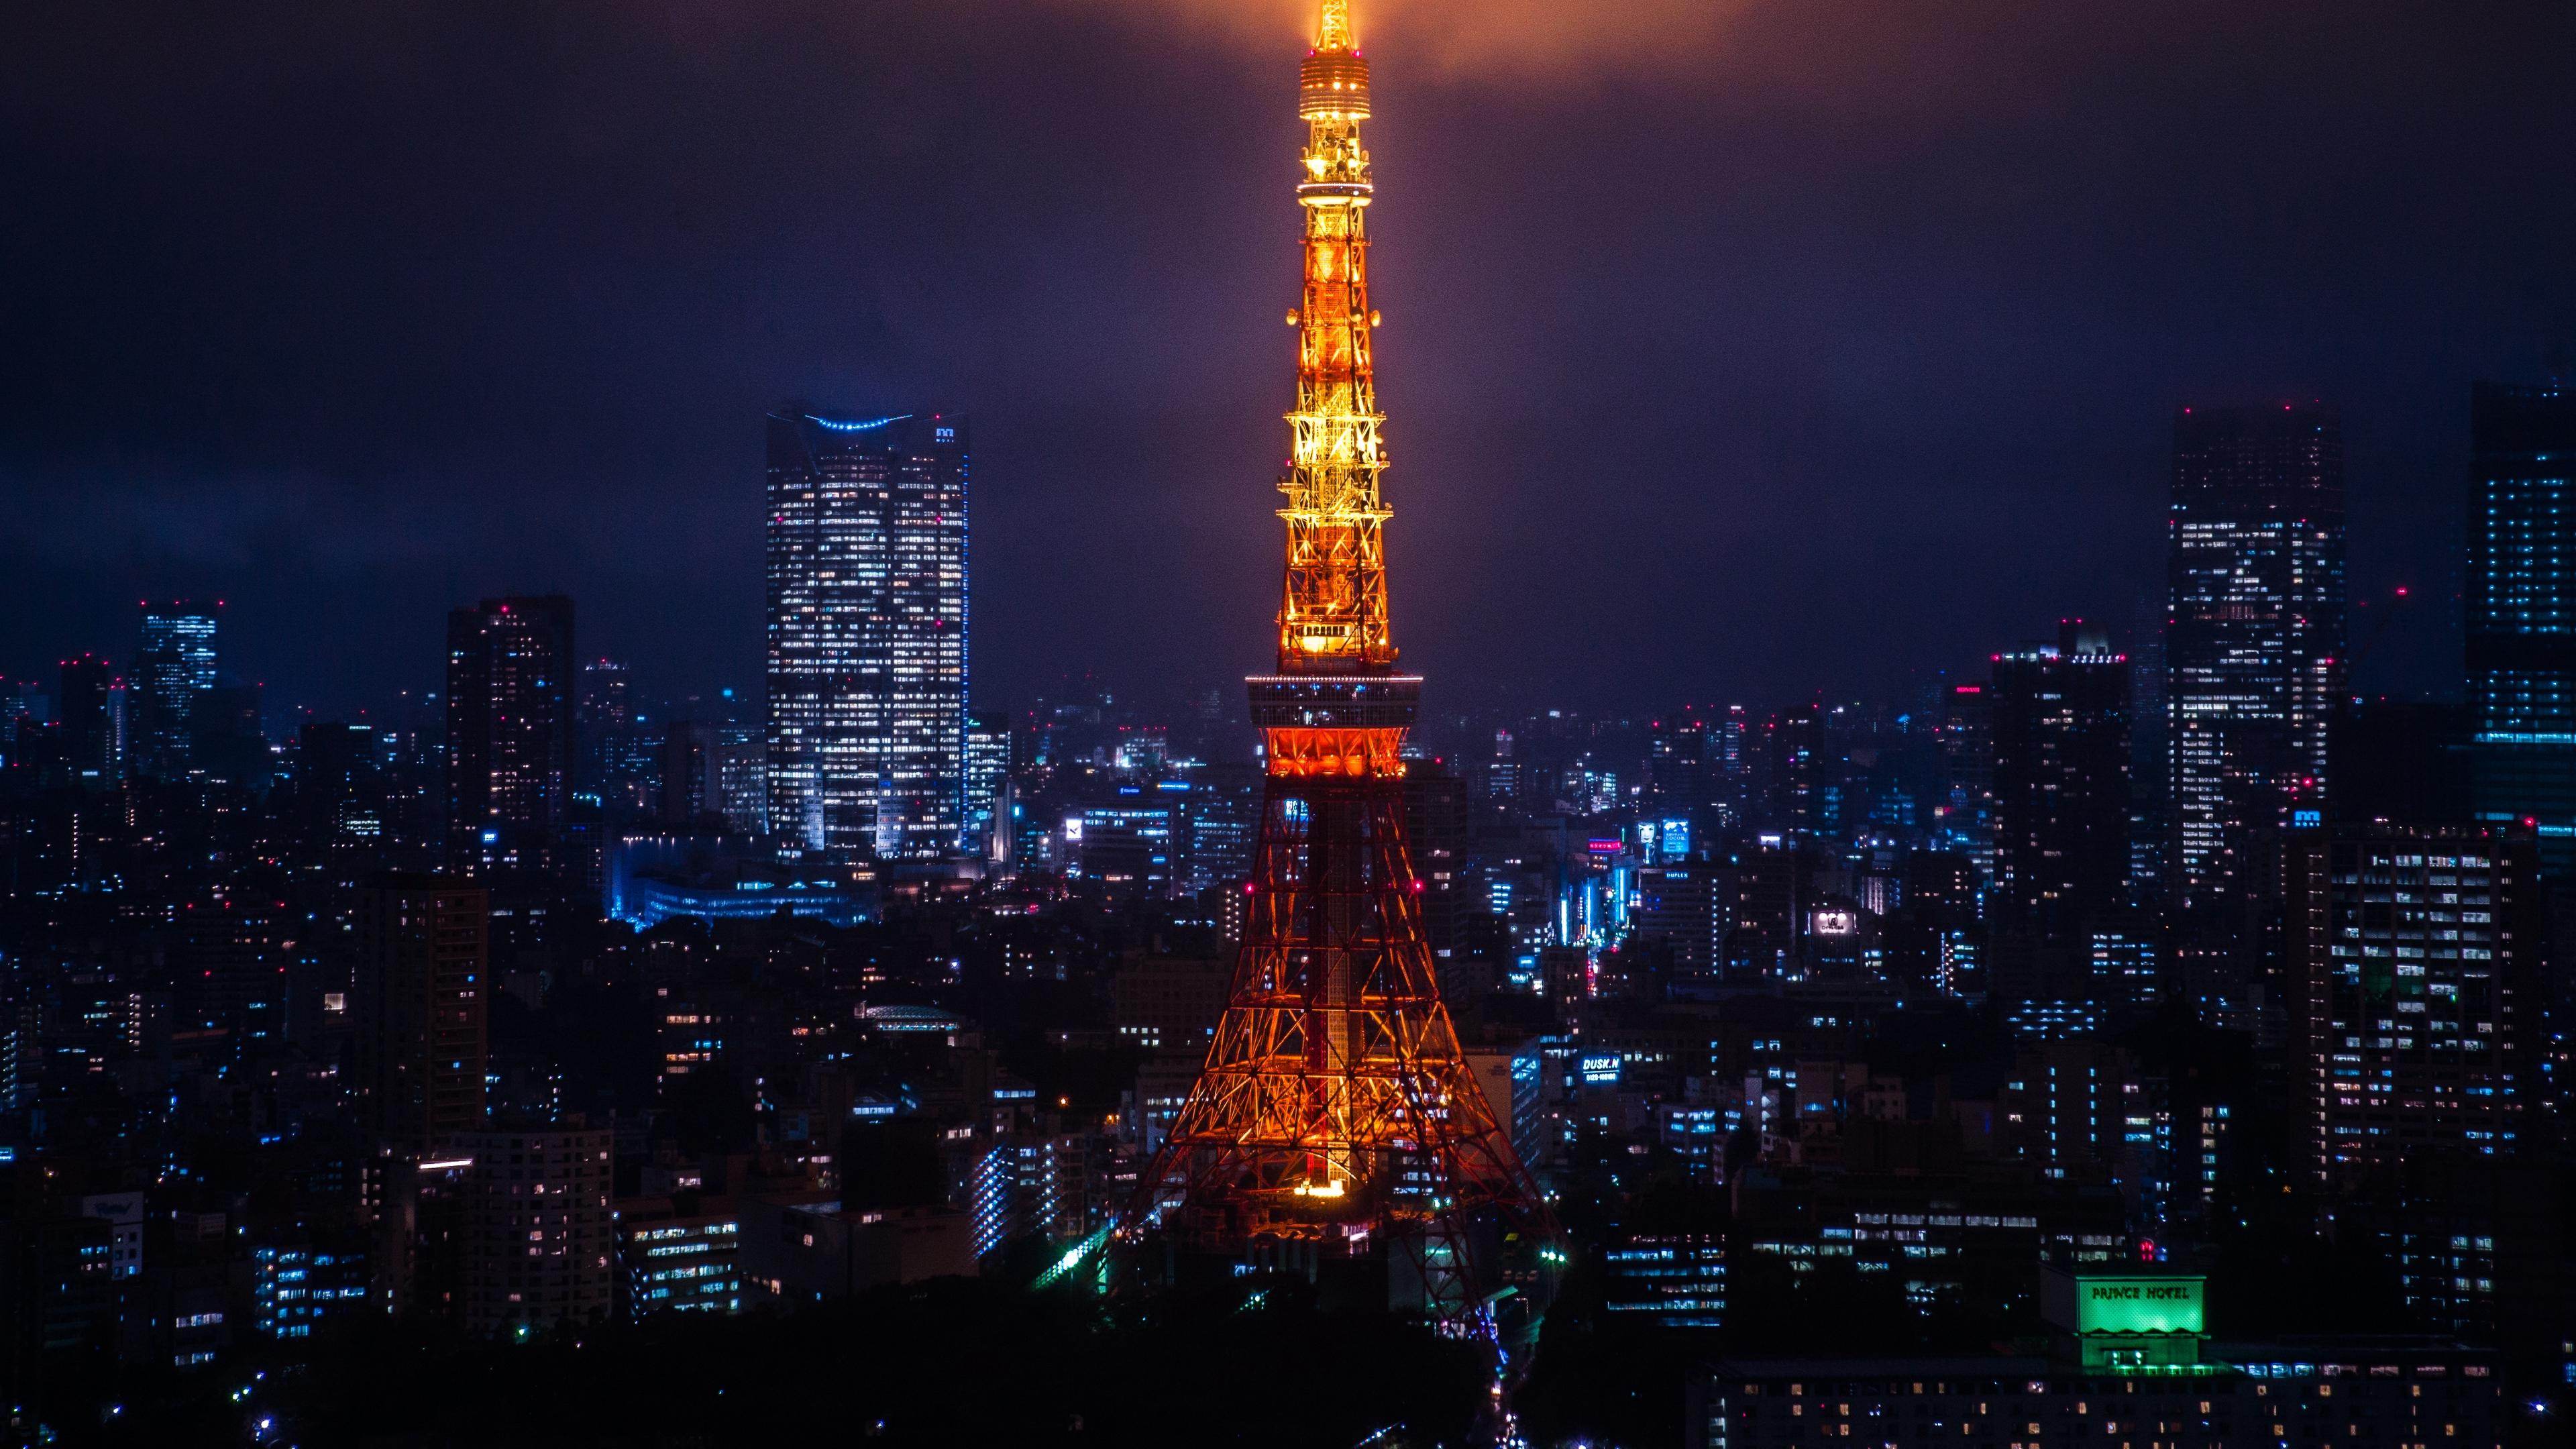 night city city lights tokyo tower 4k 1538065175 - night city, city lights, tokyo, tower 4k - Tokyo, night city, city lights